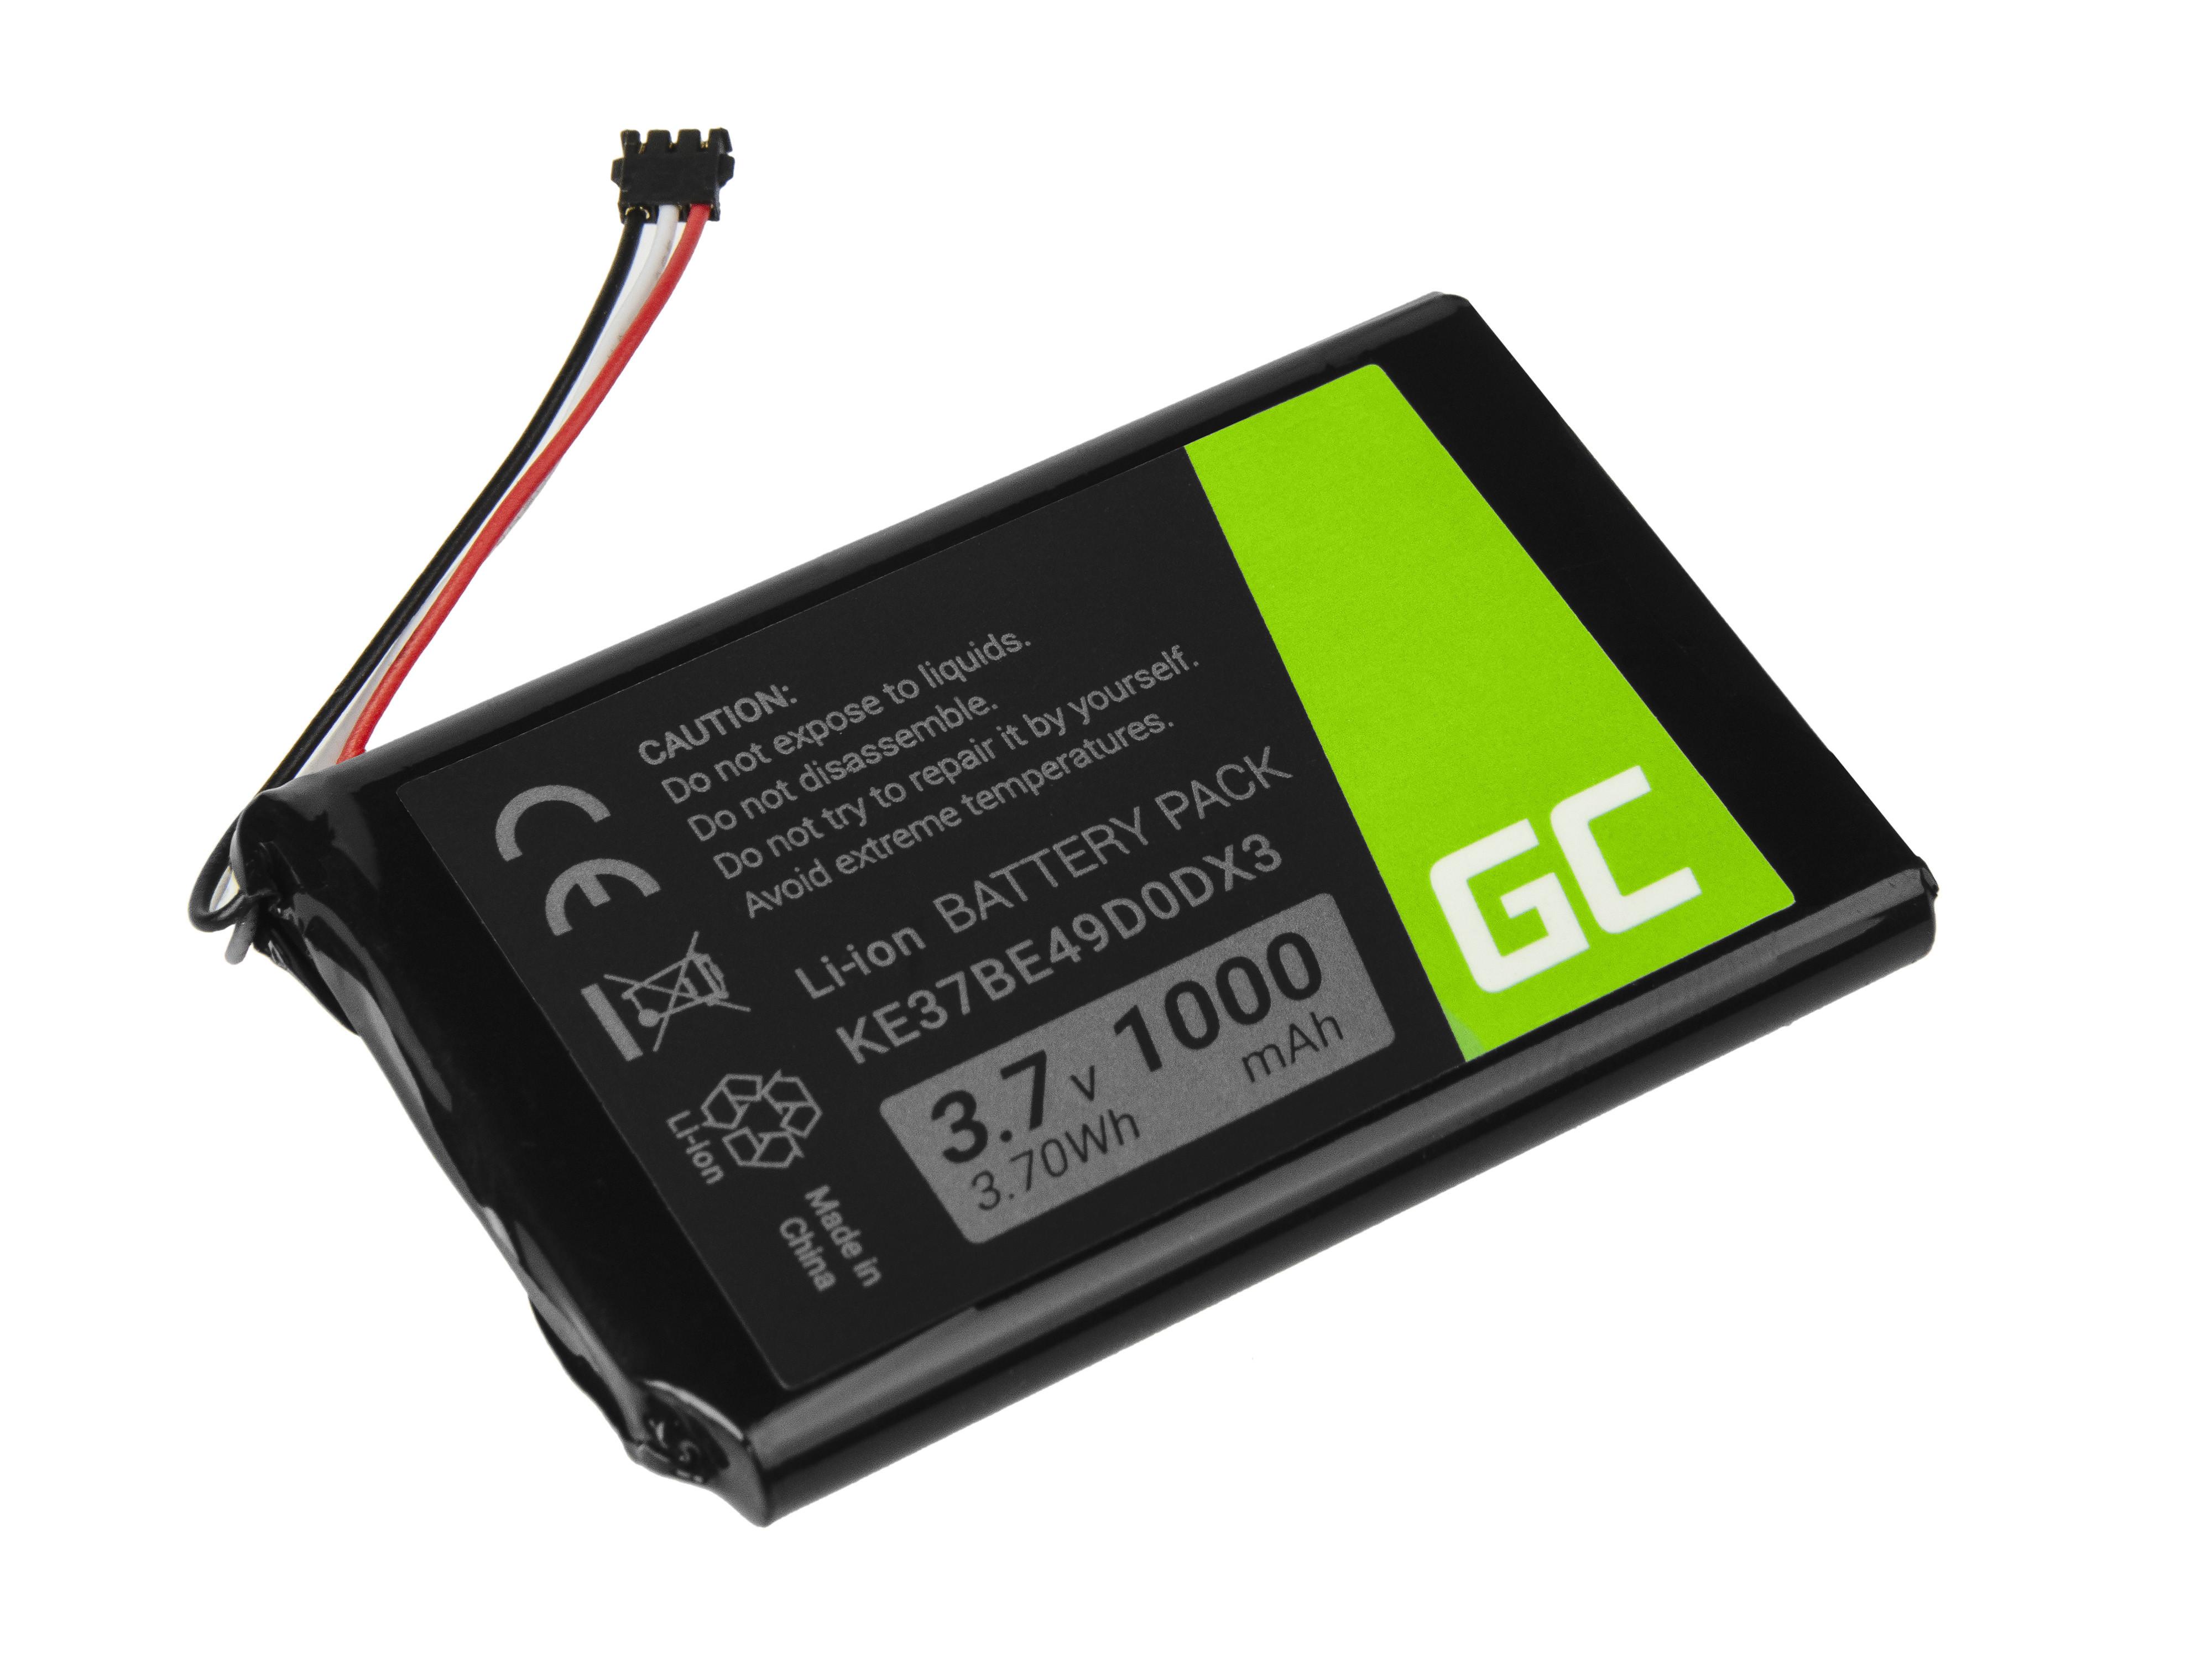 Green Cell Baterie Garmin E37BE49D0DX3 pro GPS Garmin Edge 800 810 Nuvi 1200 1260 2300 2460 2475 2515 2789LMT 1000mAh Li-ion - neoriginální